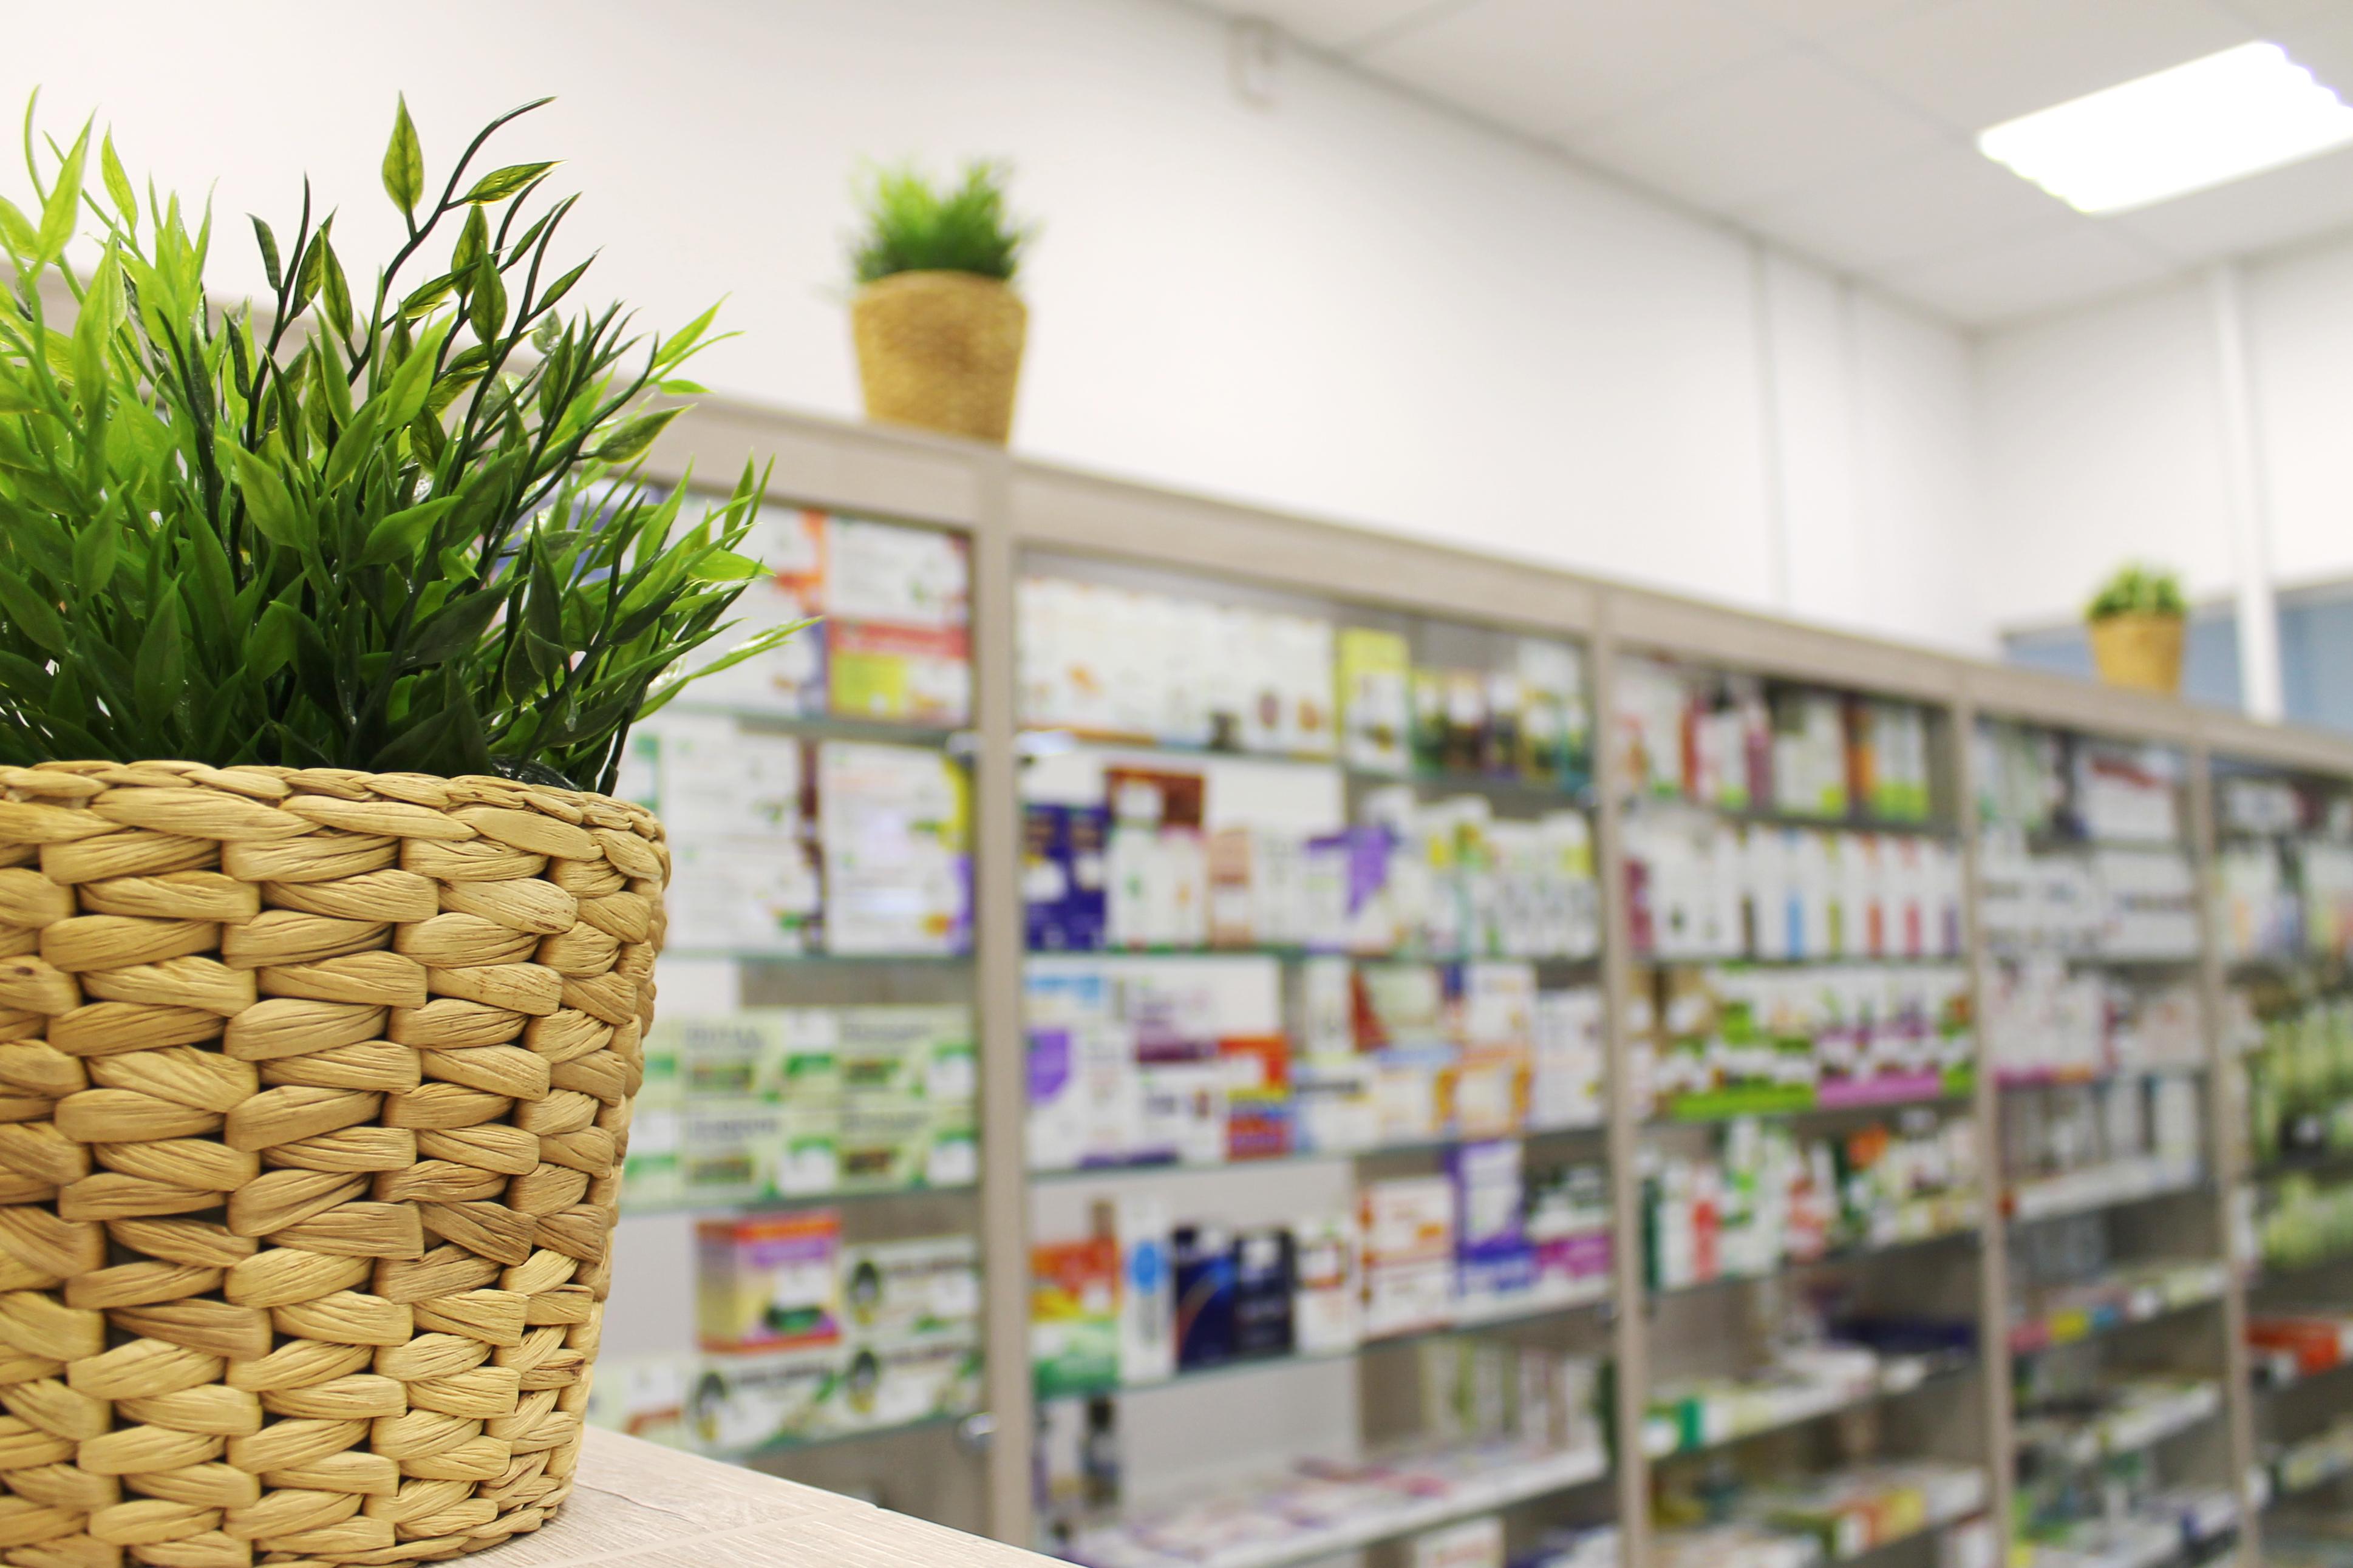 Картинки по запросу картинка масло в аптеке на полке